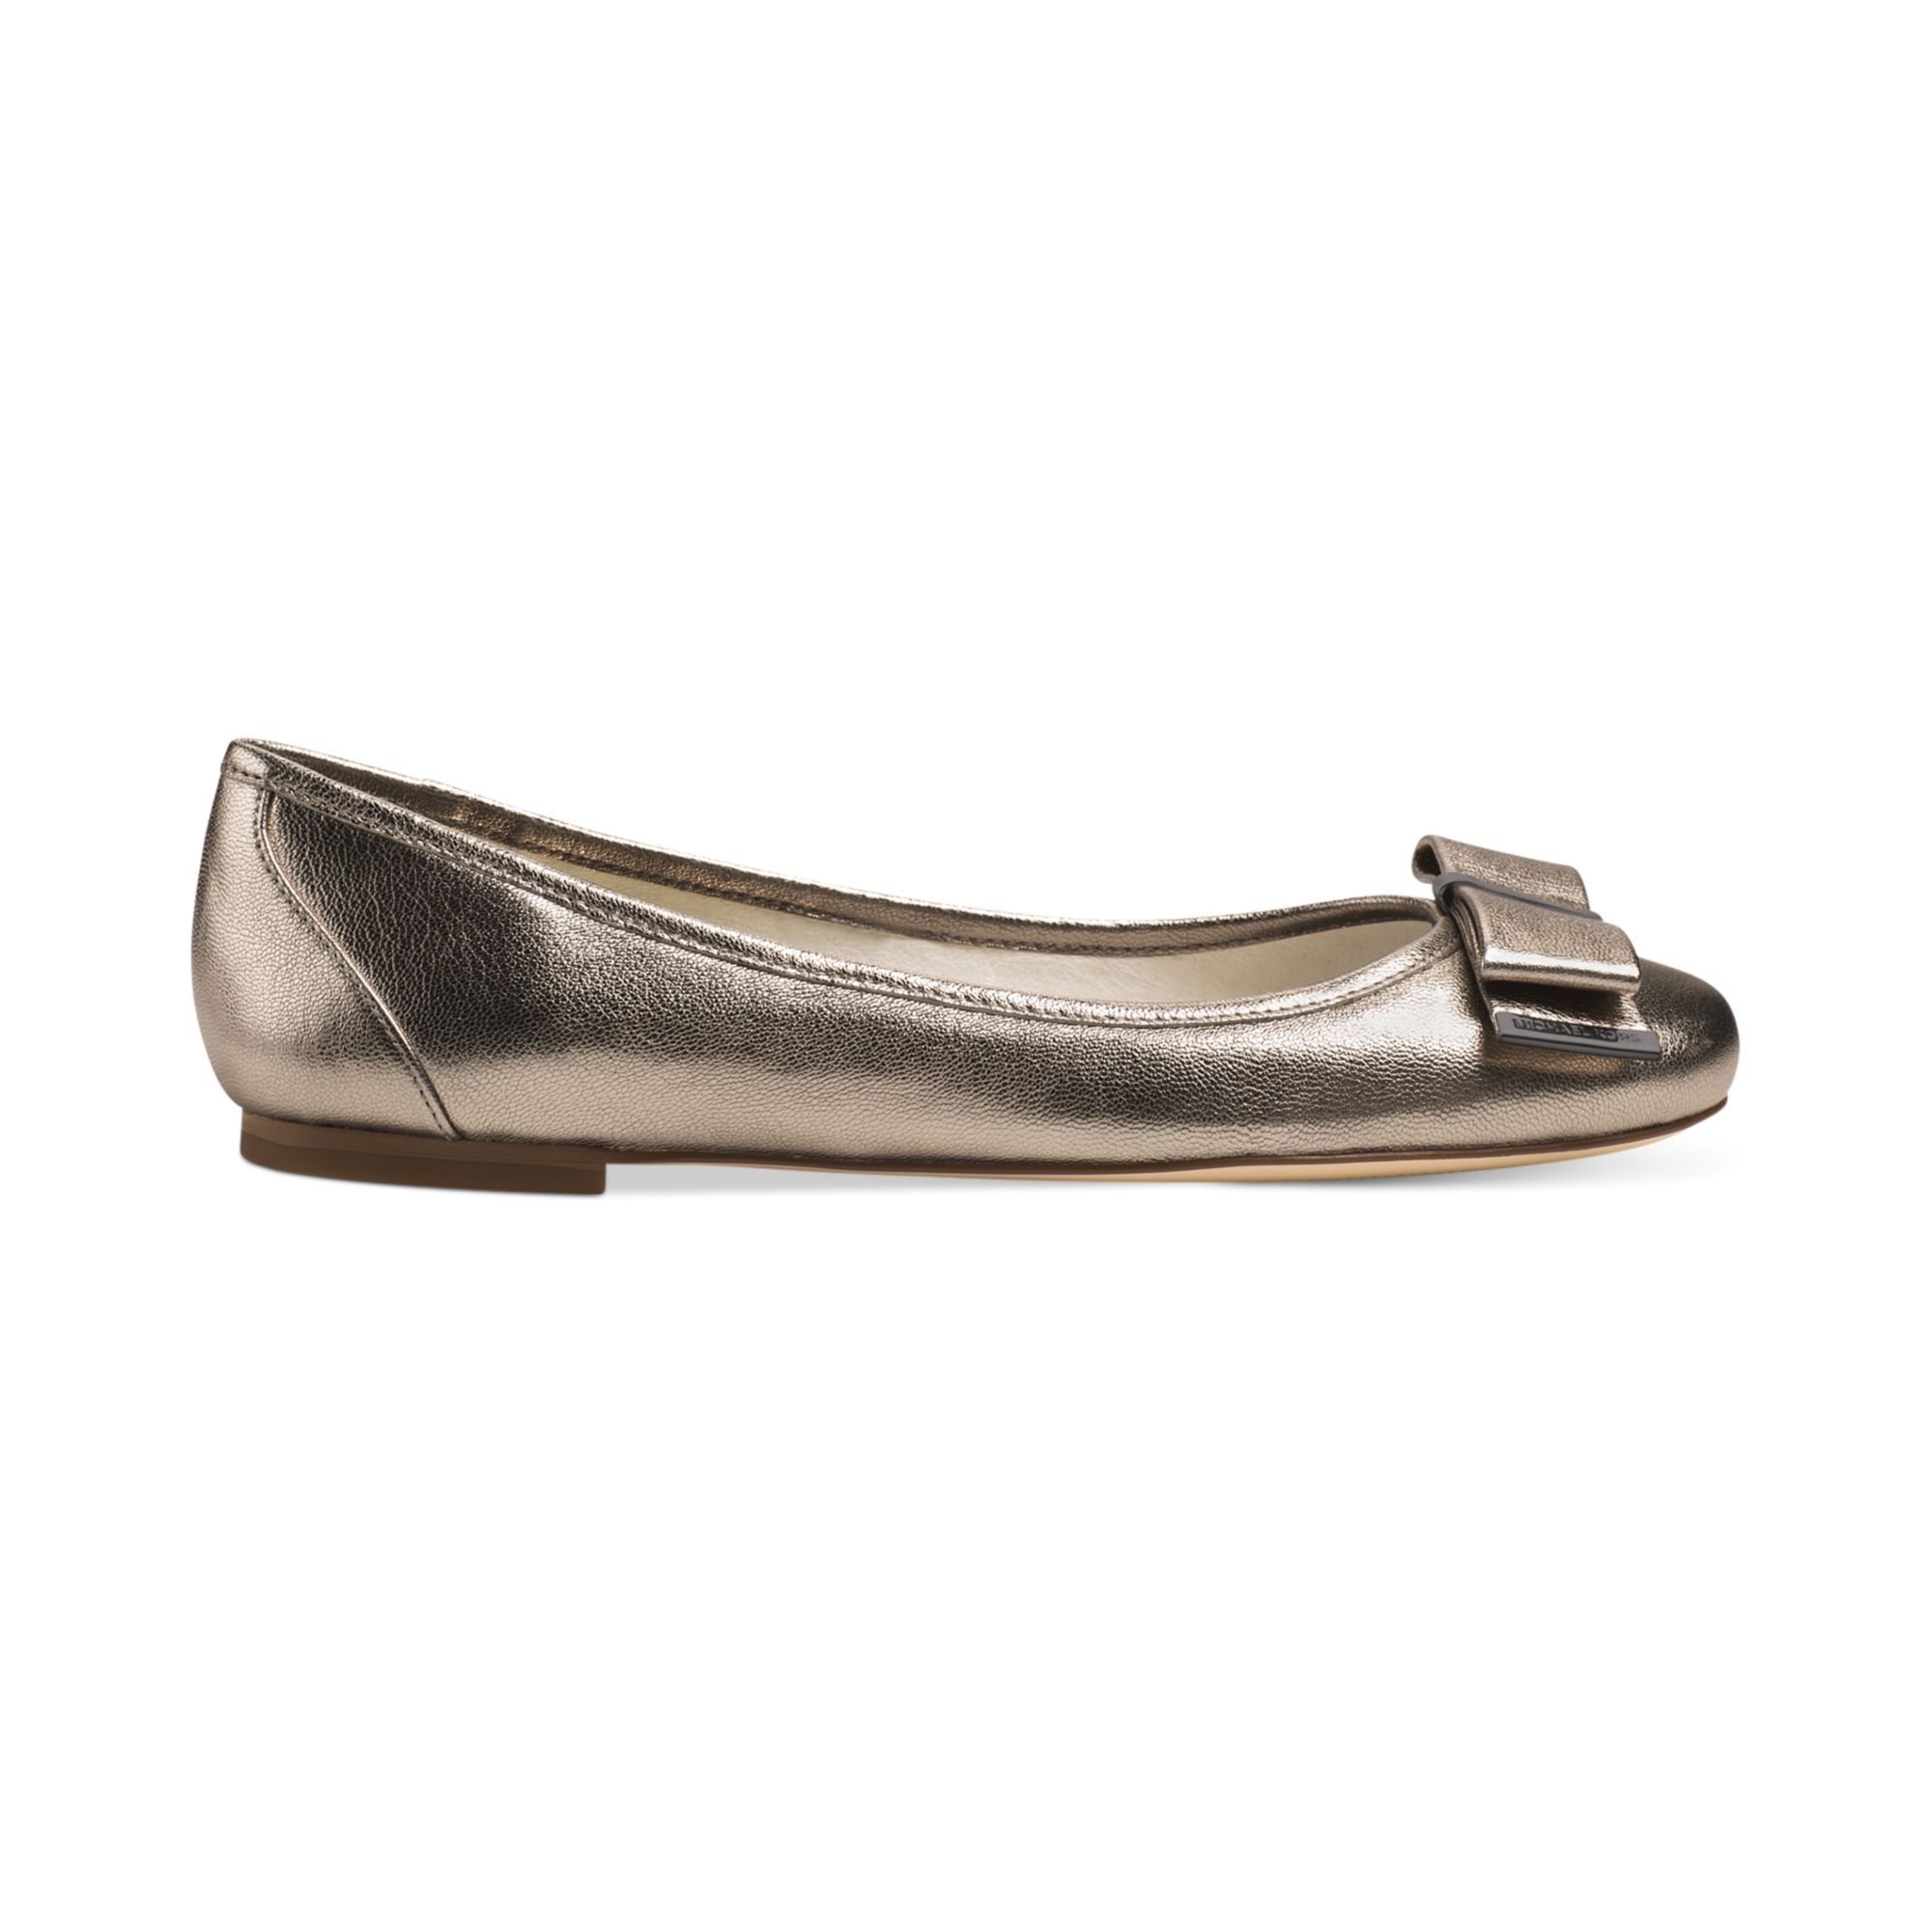 Michael Kors Flat Shoes Shopstyle